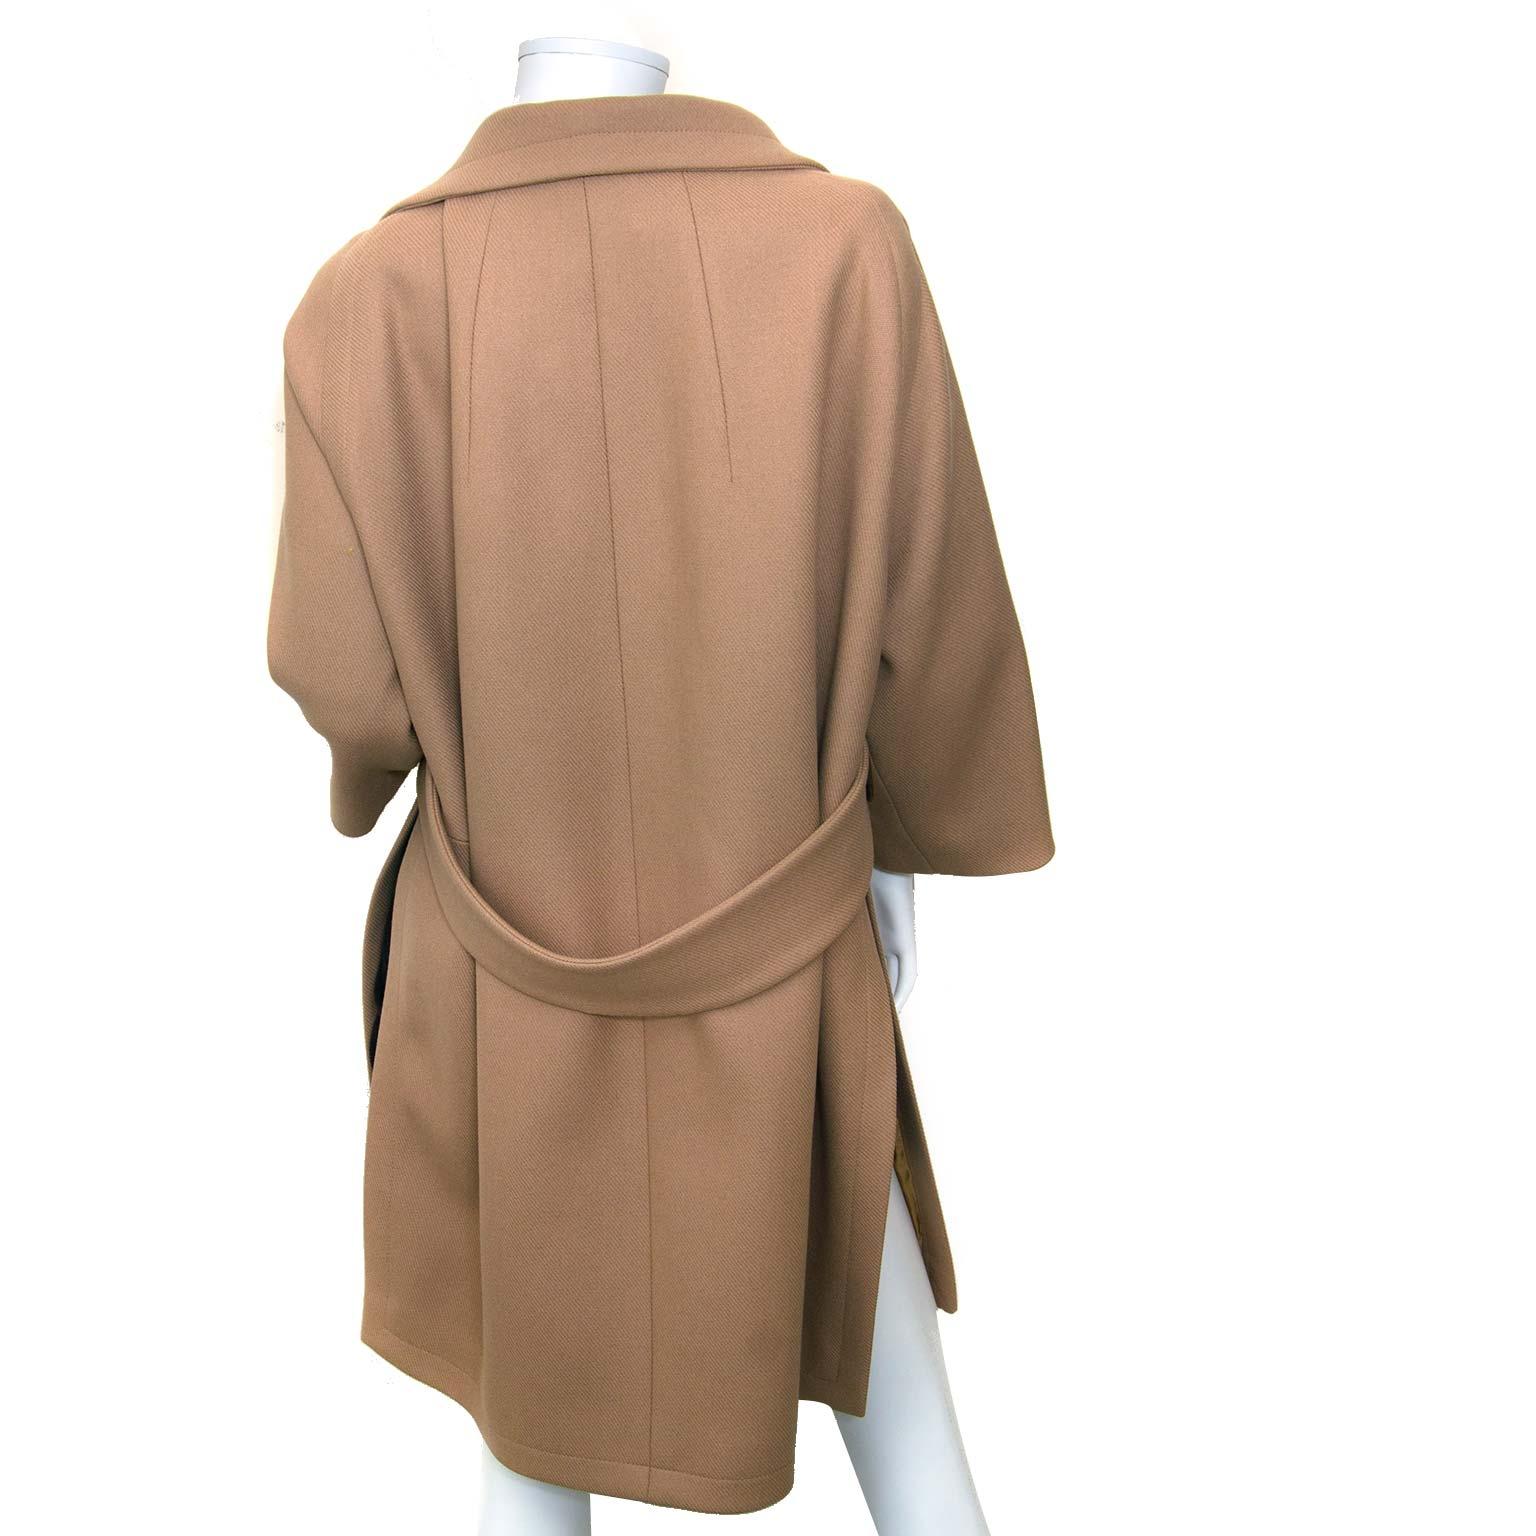 achetez Chloé Camel Coat - Size 38 chez labellov